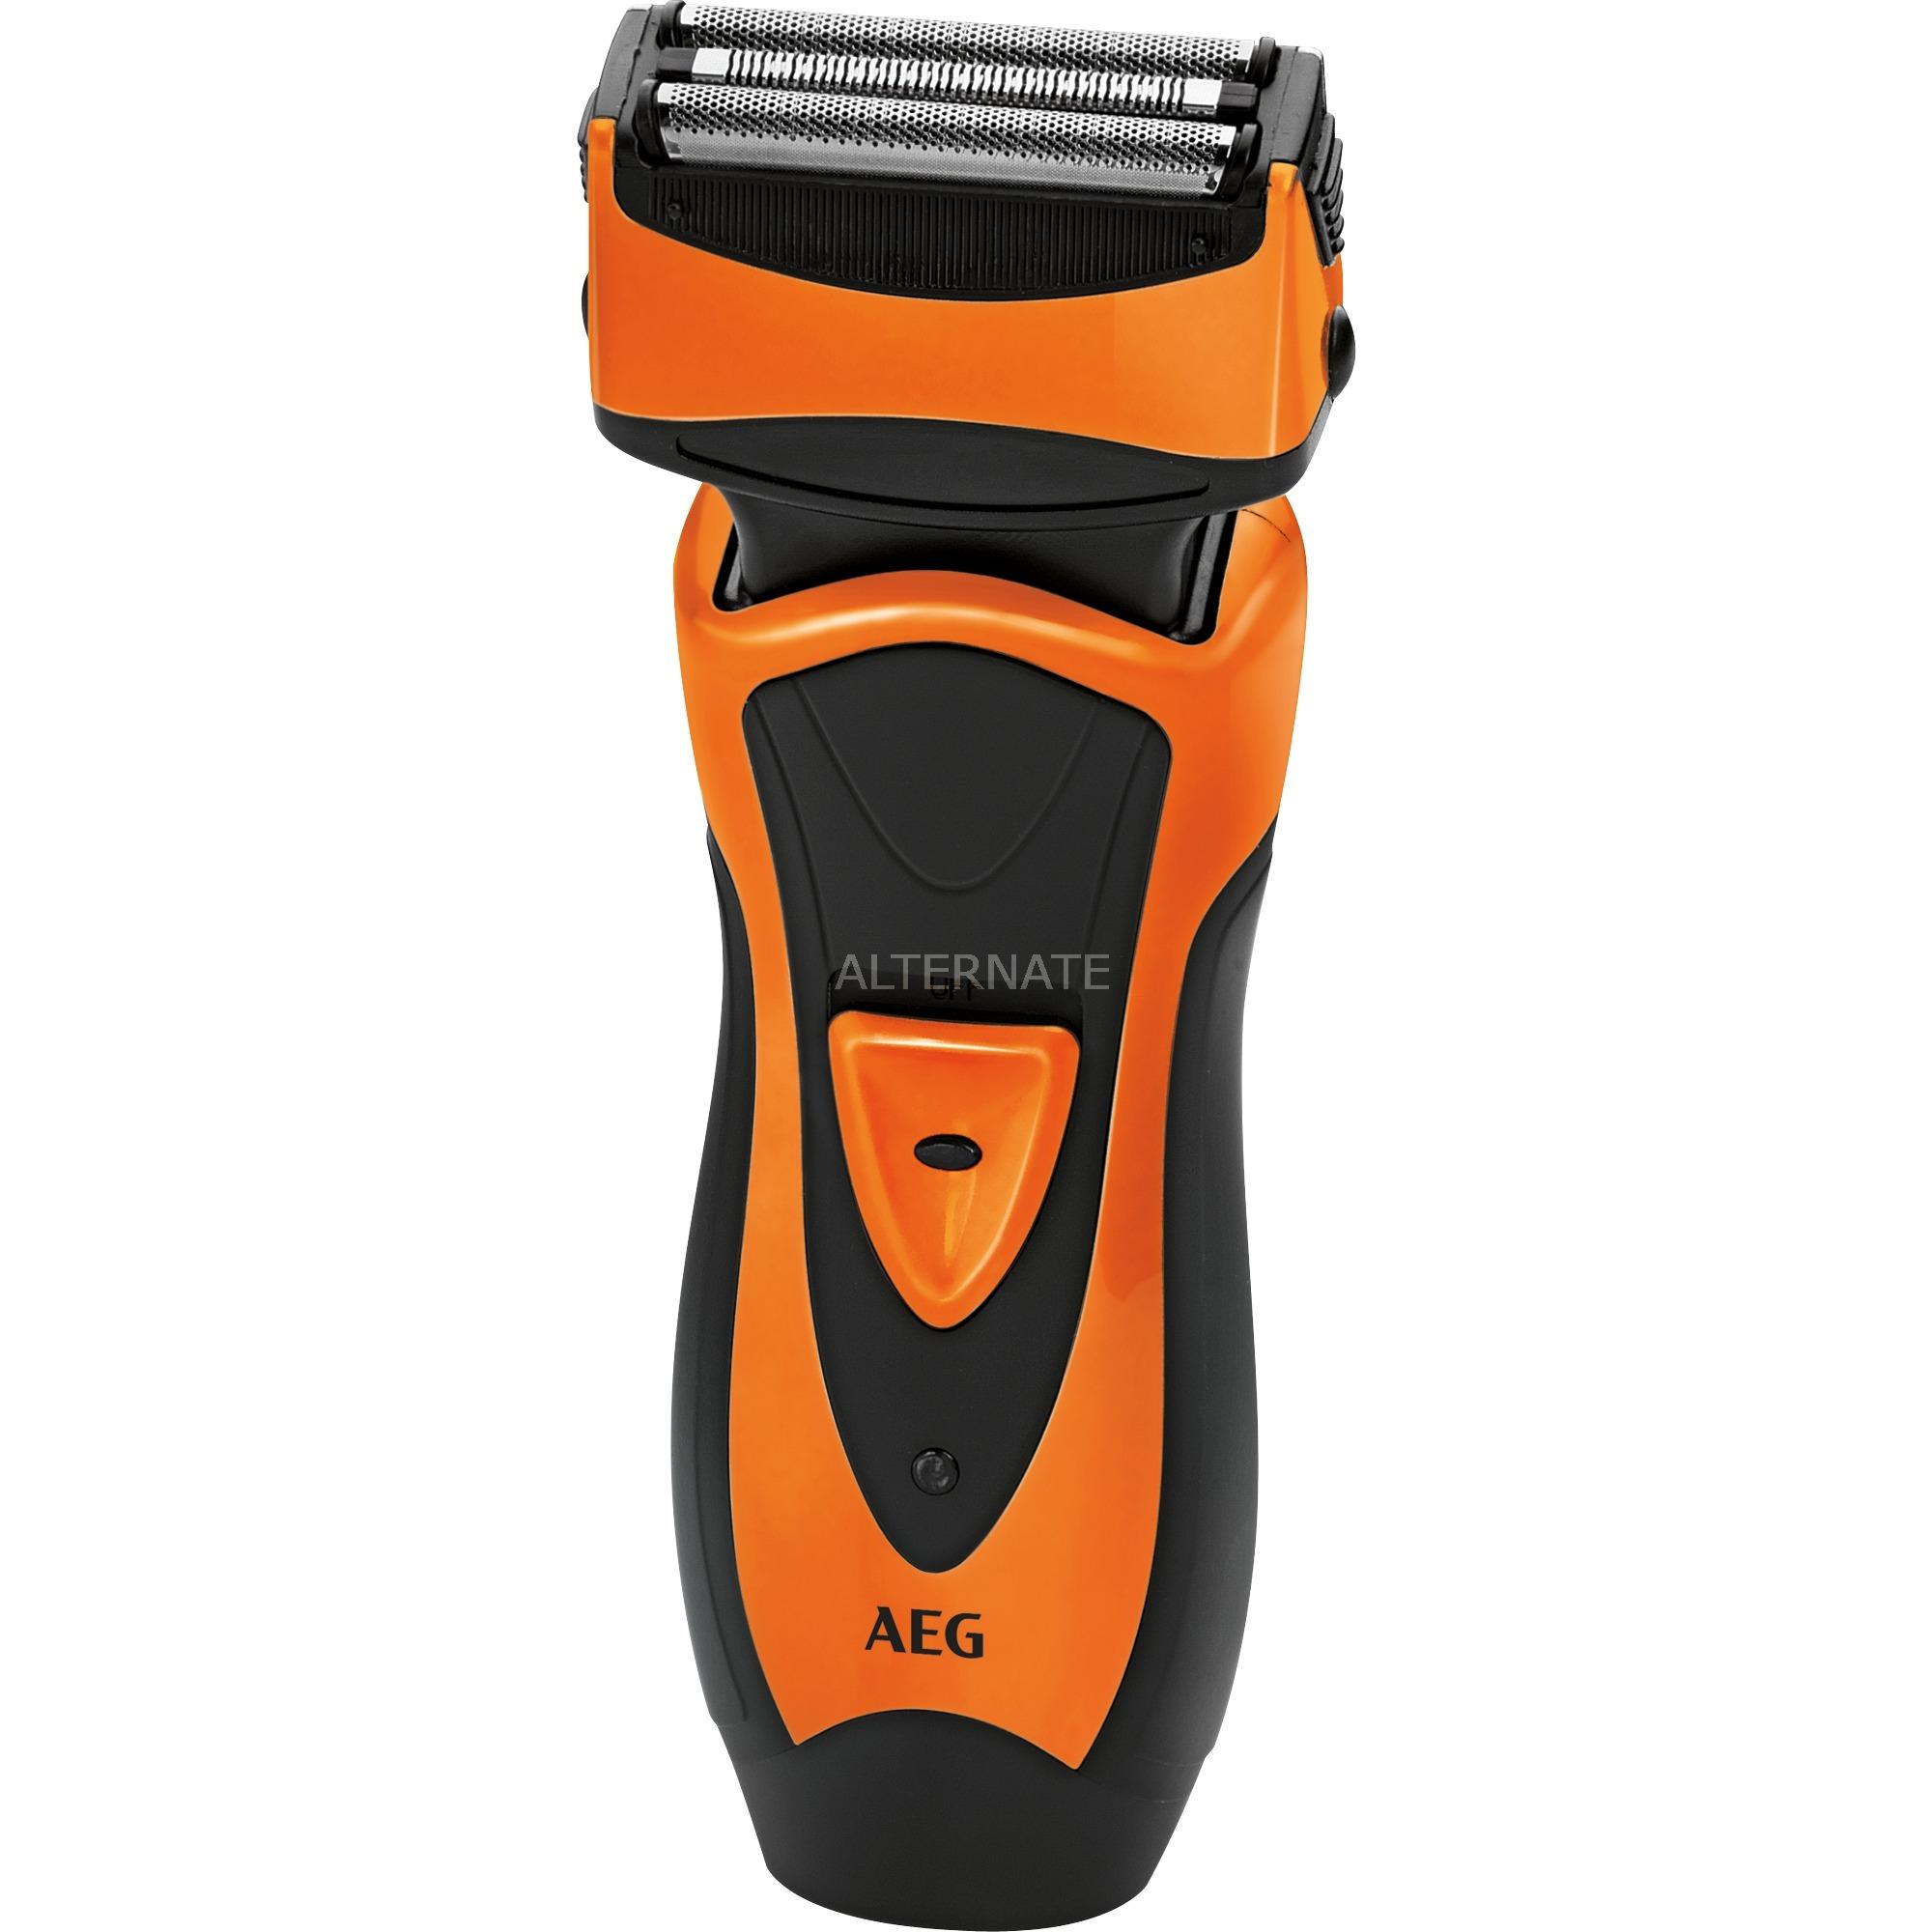 HR 5626 afeitadora Máquina de afeitar de láminas Recortadora Naranja